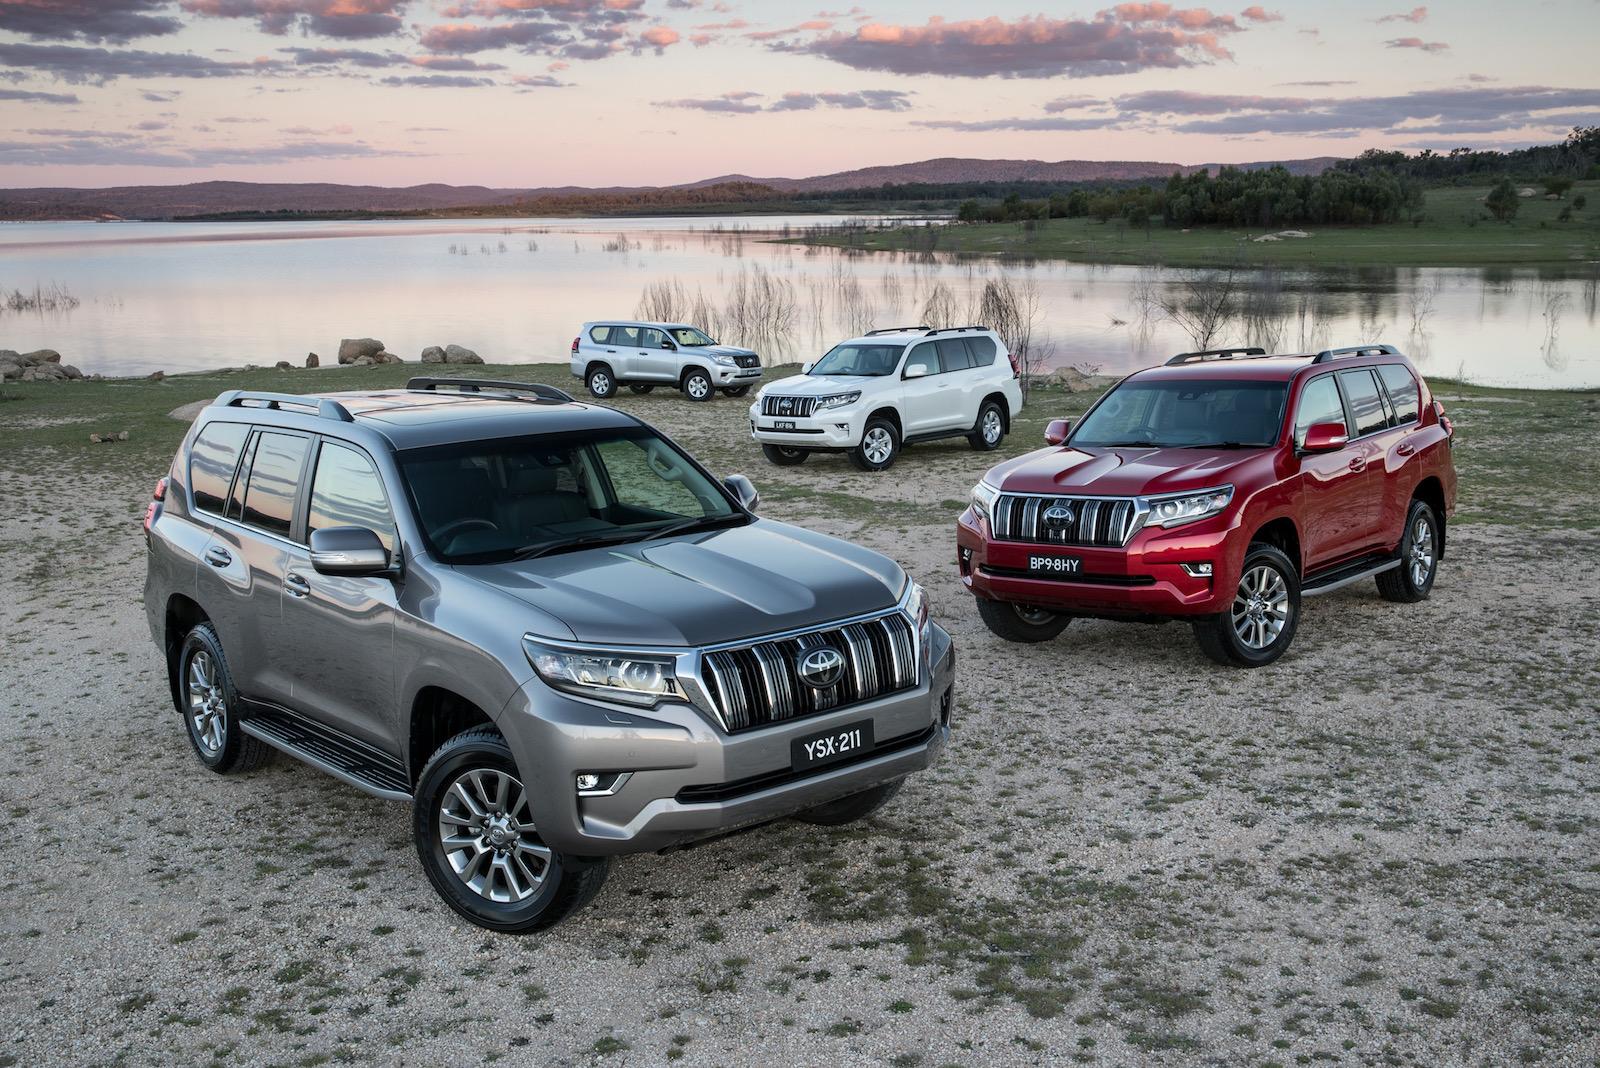 2018 Toyota LandCruiser Prado now on sale in Australia | PerformanceDrive